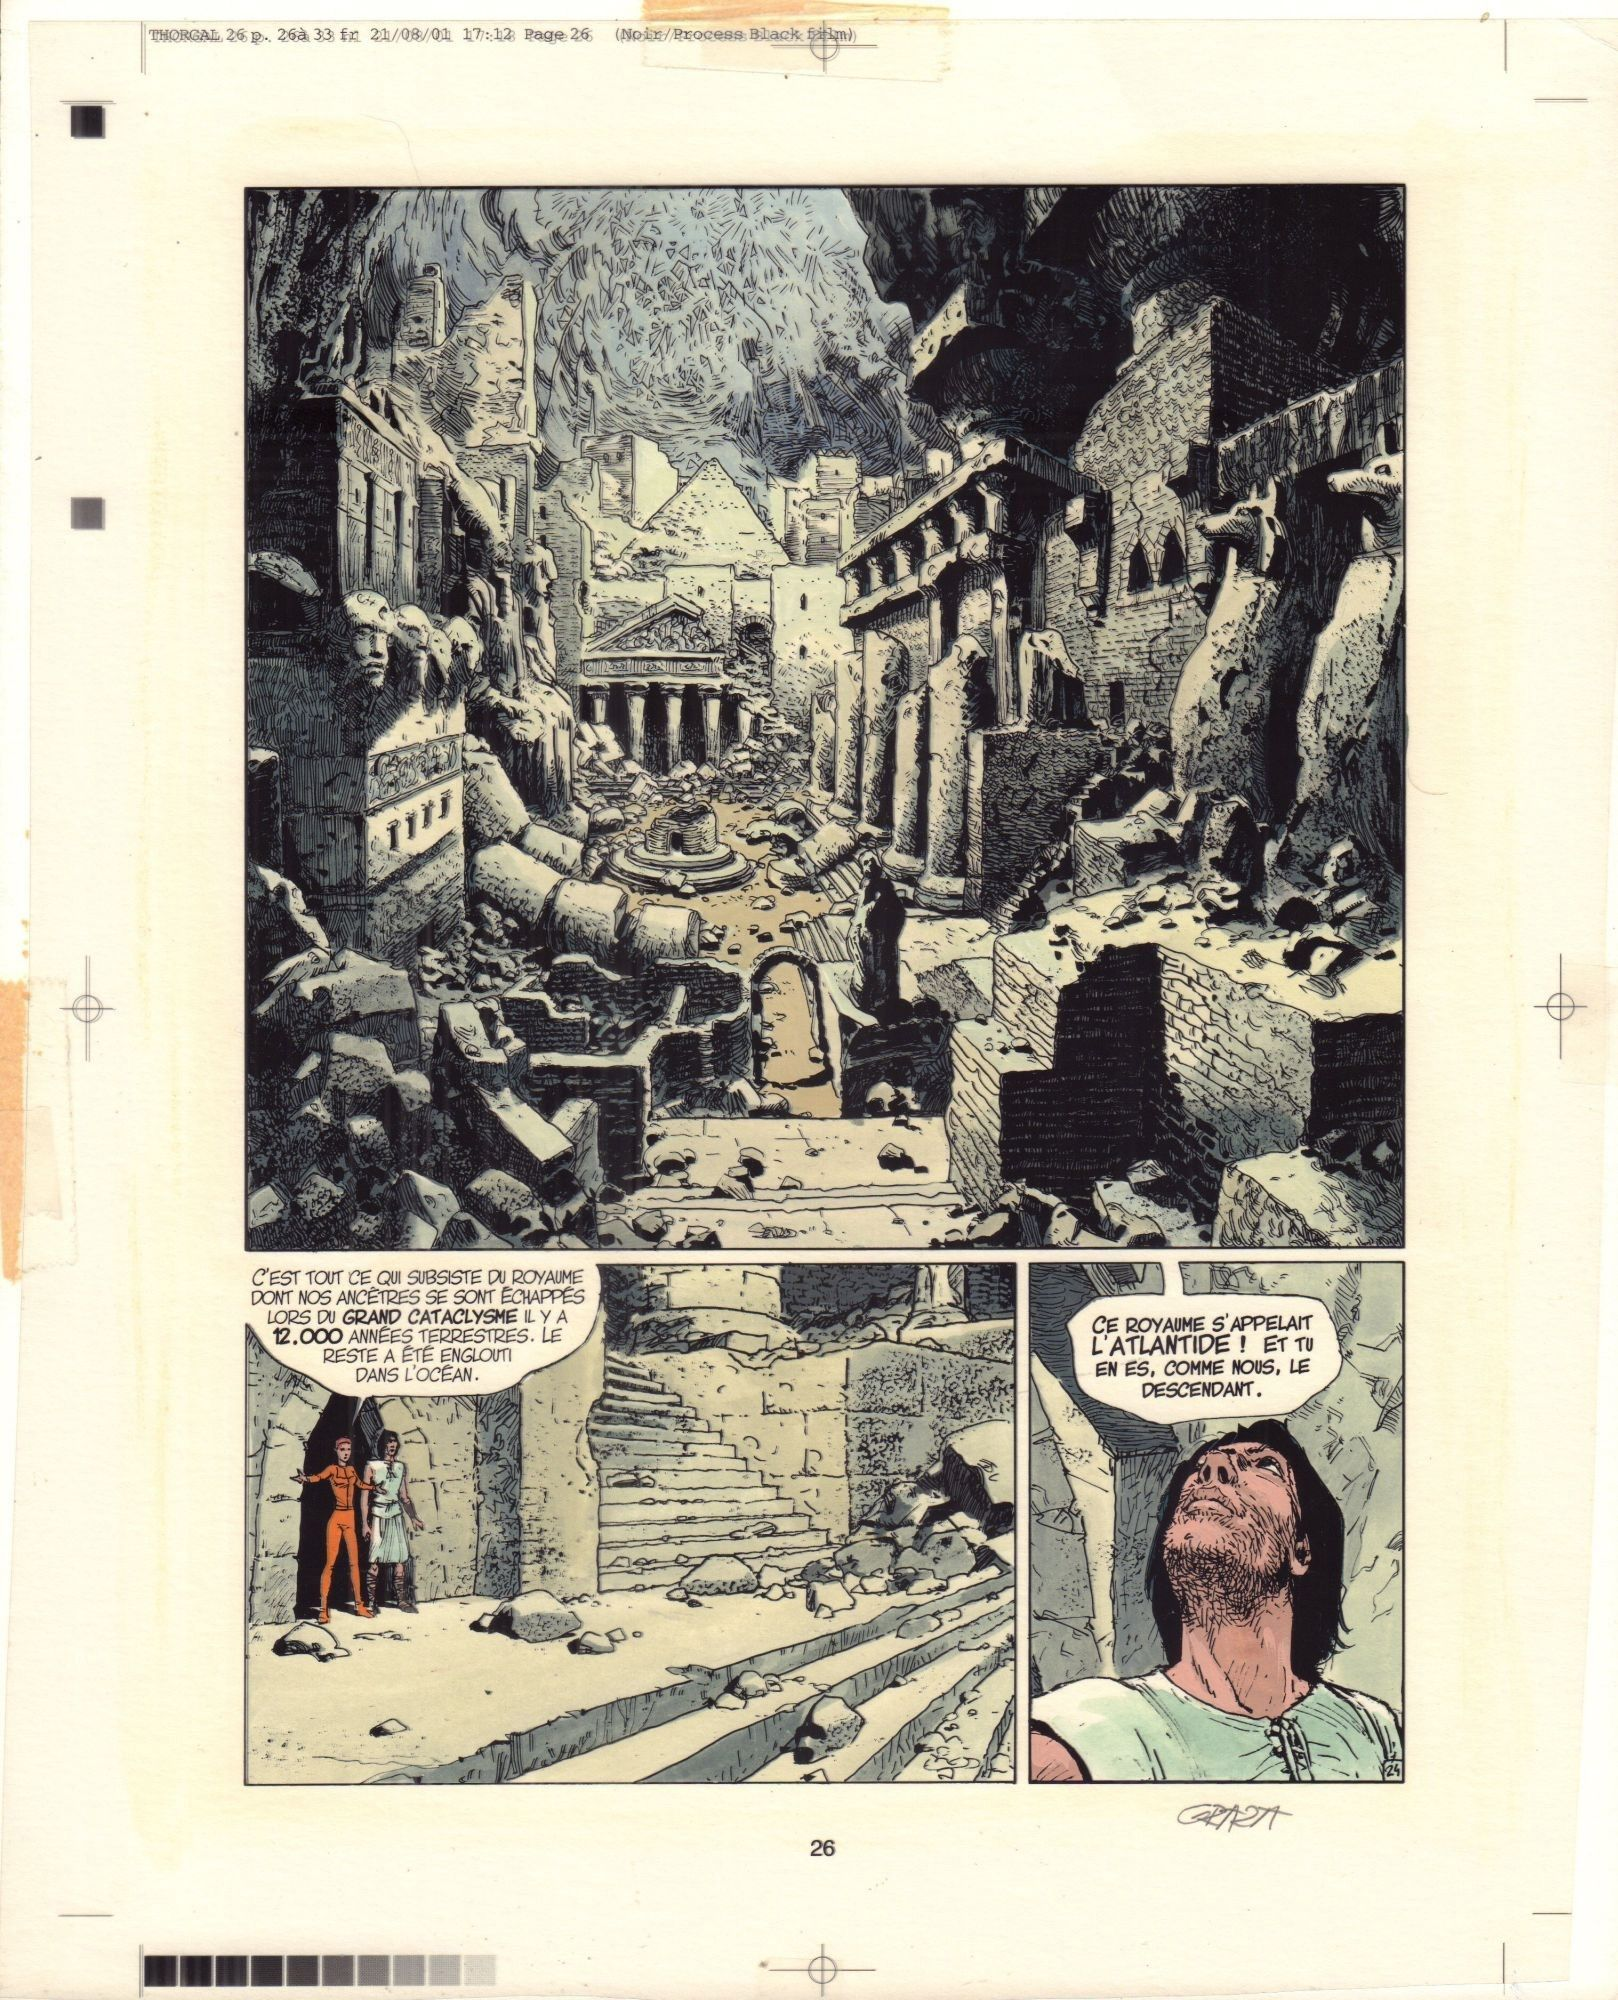 Thorgal. Królestwo pod piaskiem, s. 24 (kolor)